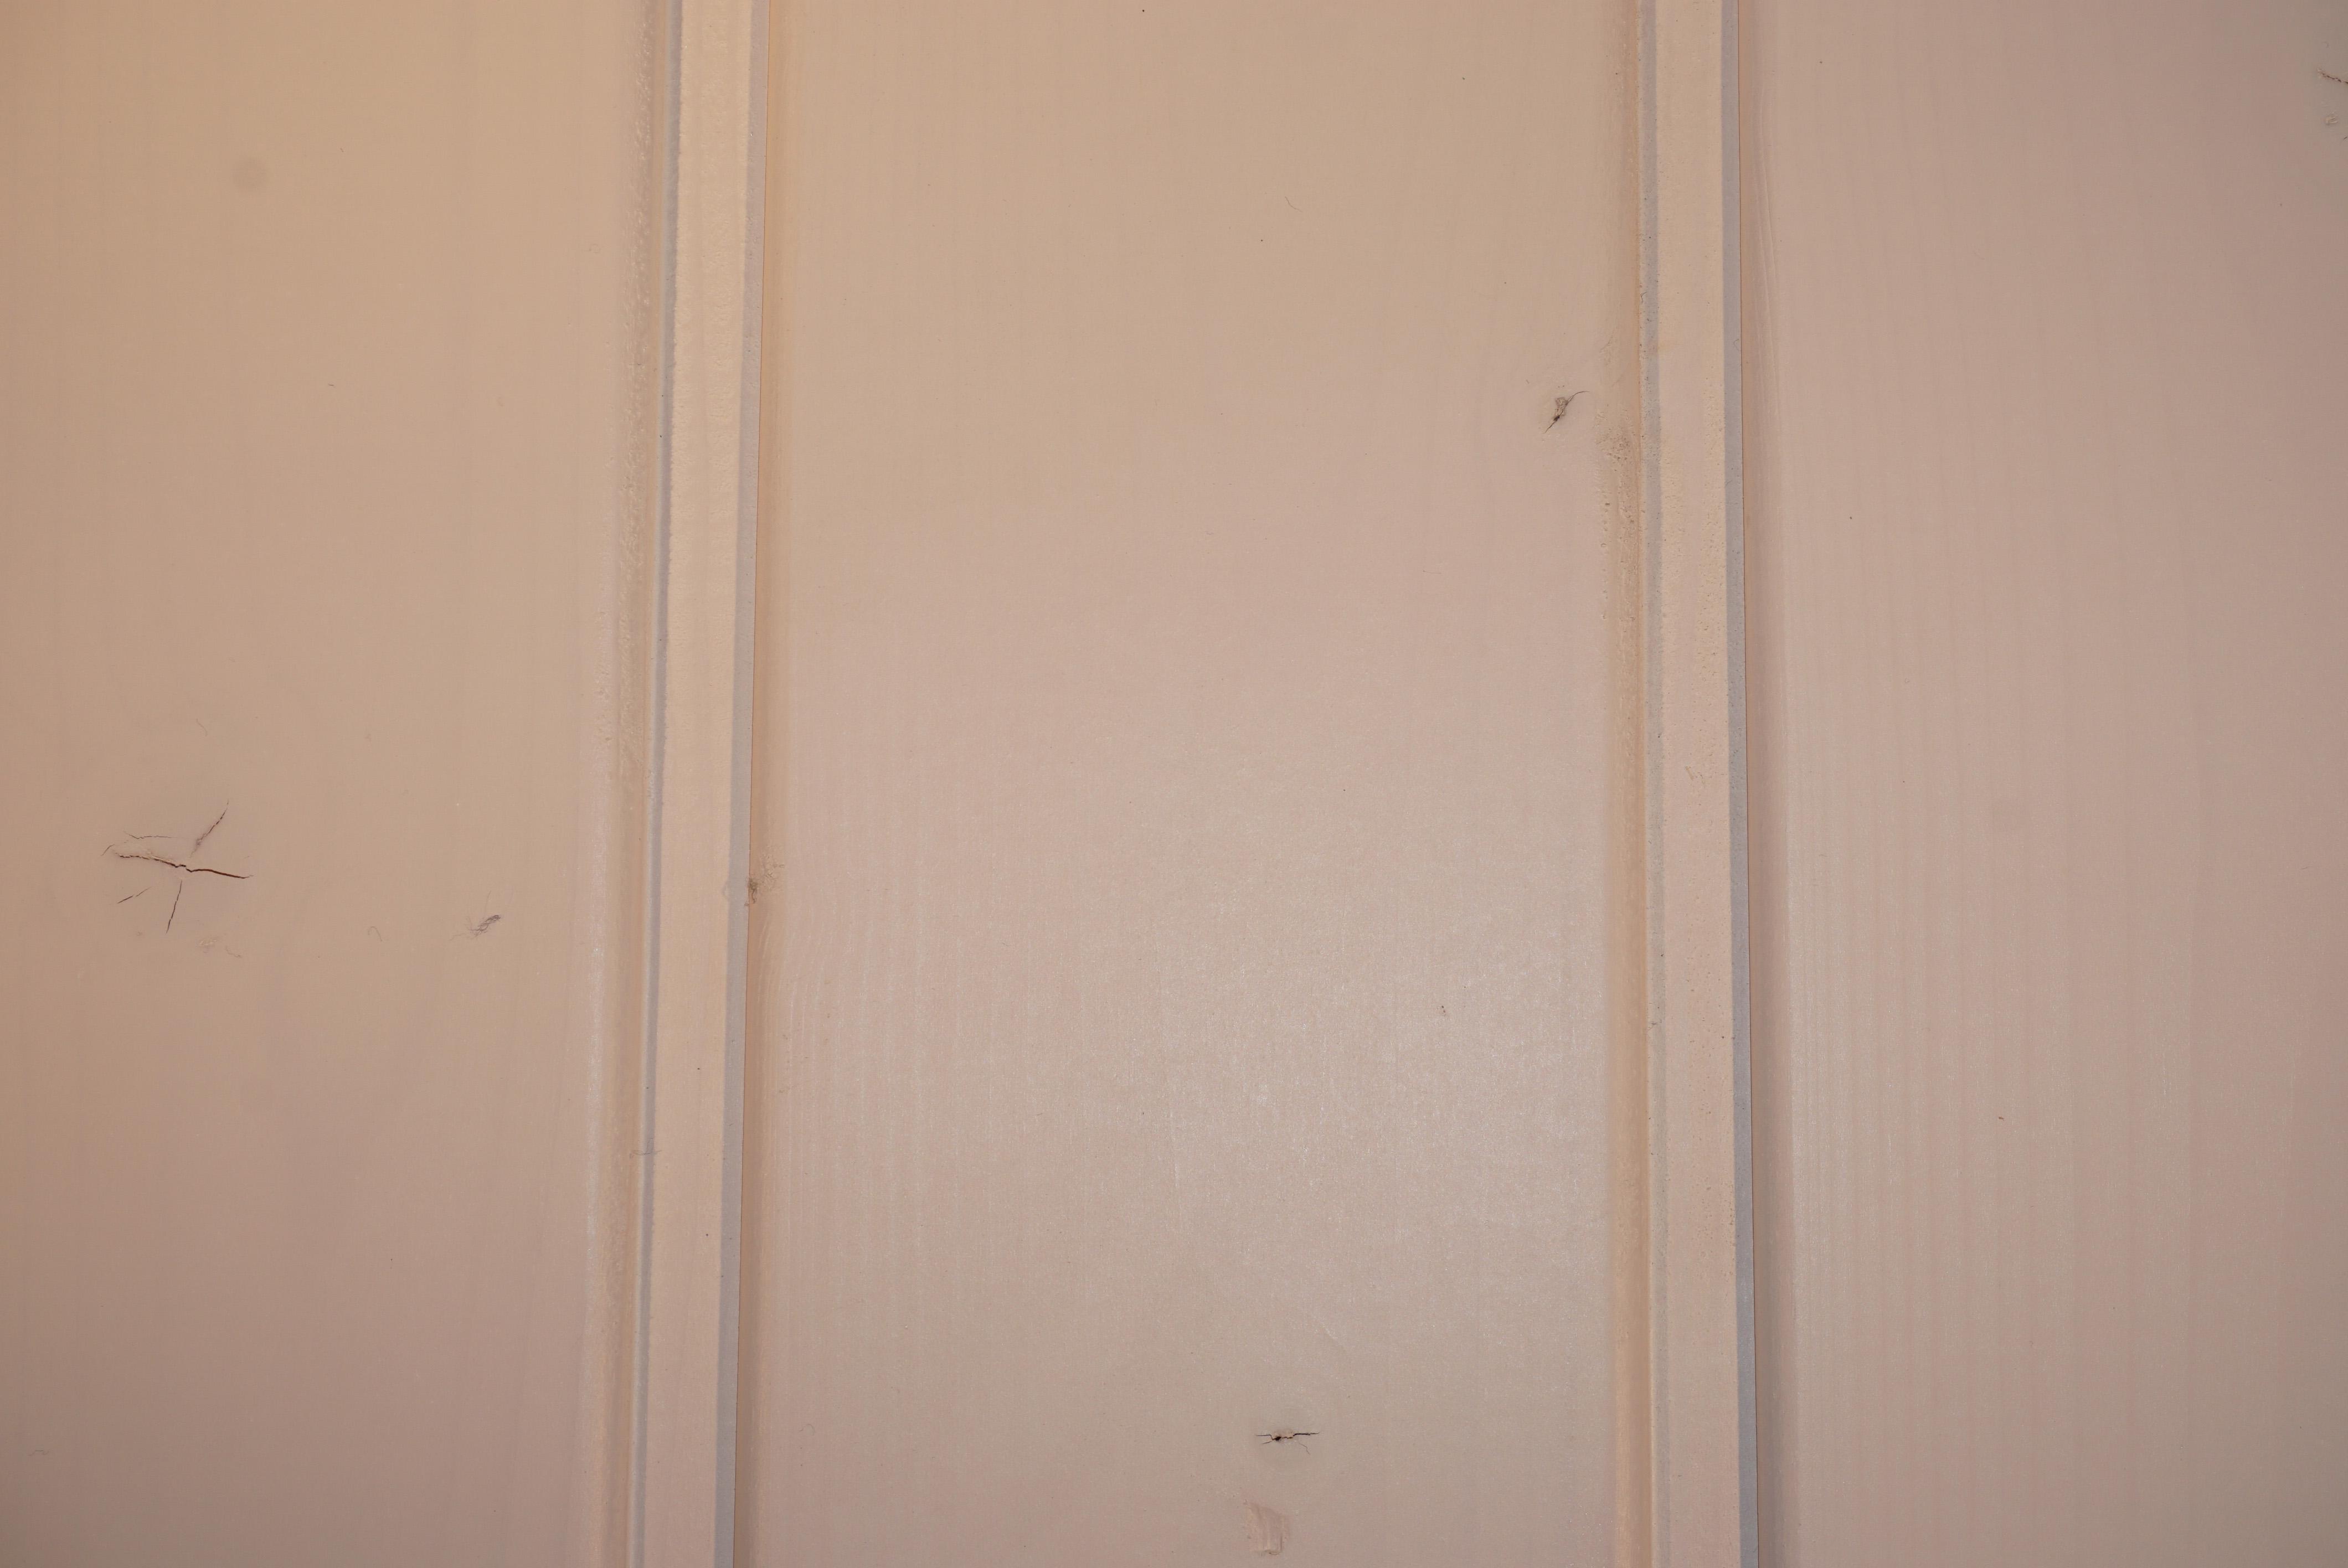 14 x 121 mm profilholz nord fi deckend wei endbehandelt a sortierung holzfachmarkt sturhan. Black Bedroom Furniture Sets. Home Design Ideas